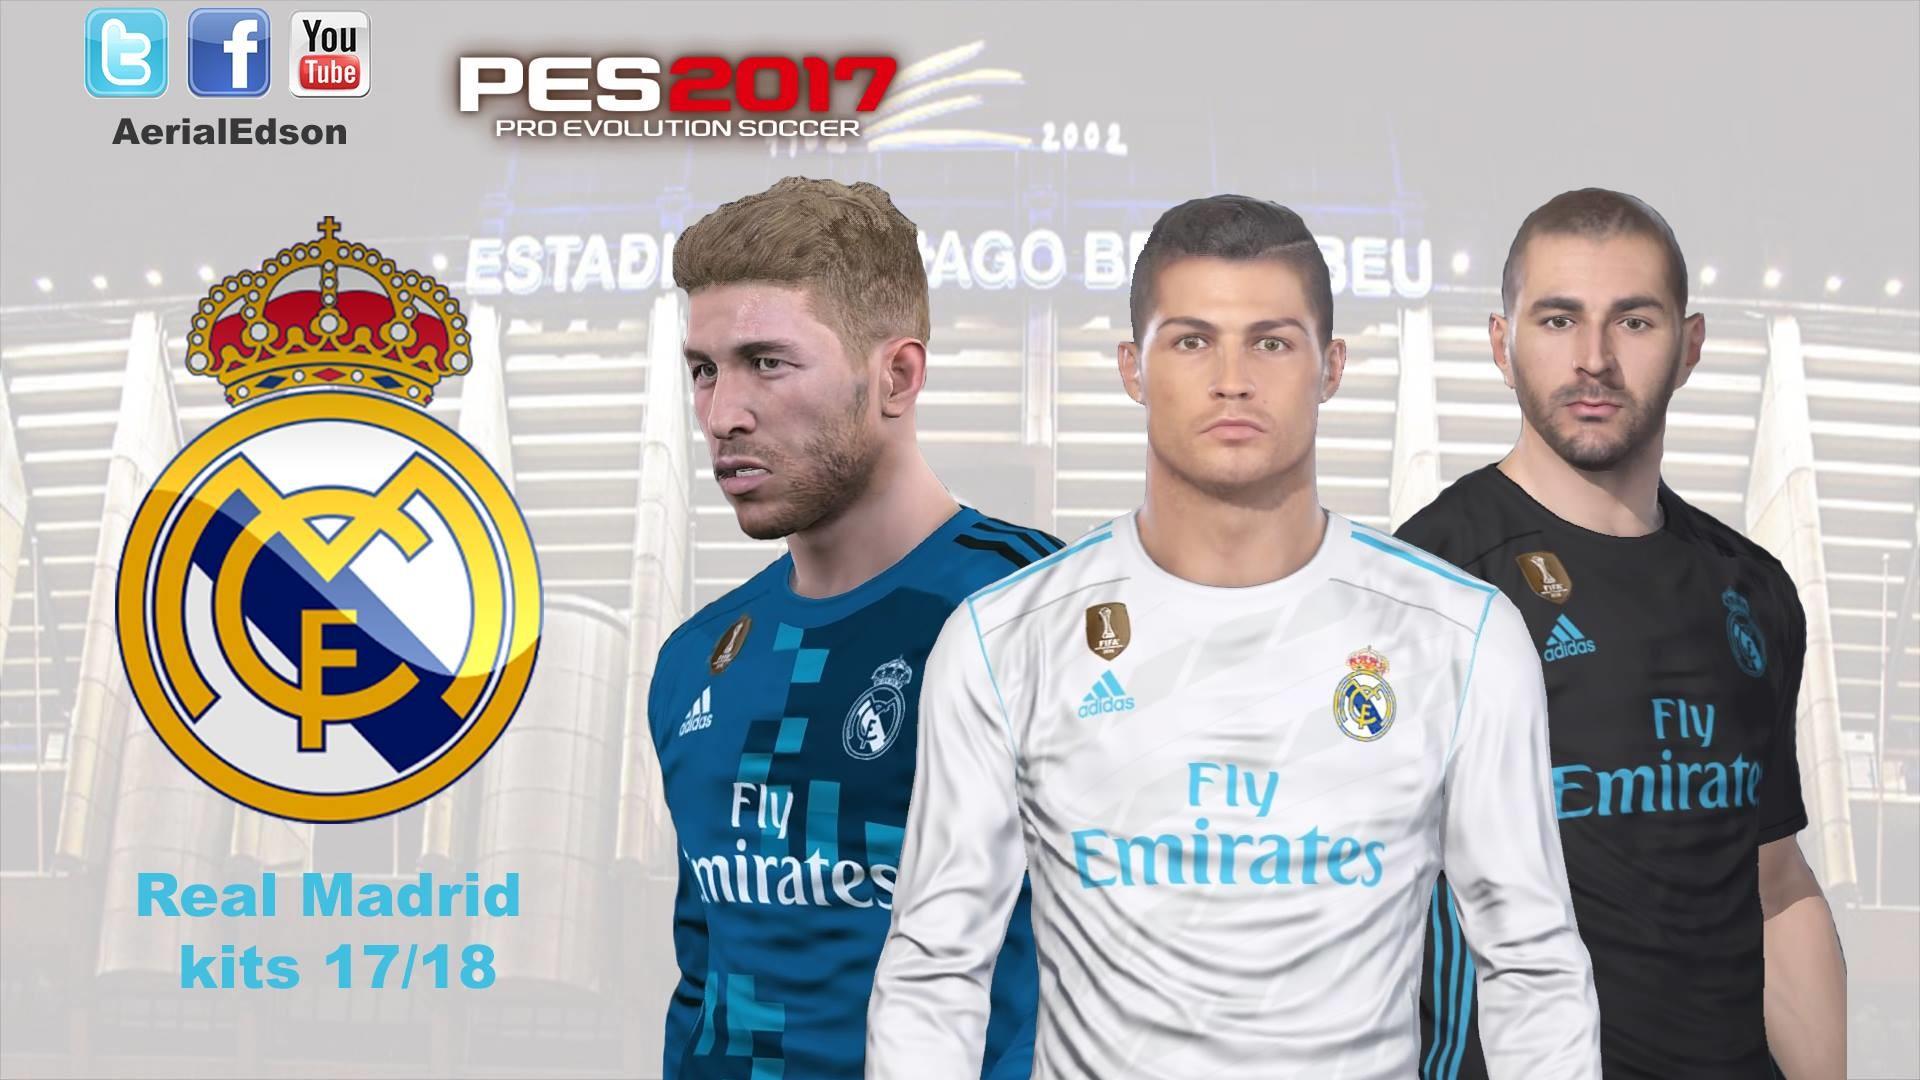 1920x1080 Download PES2017 Real Madrid 2017 2018 Kit Pack